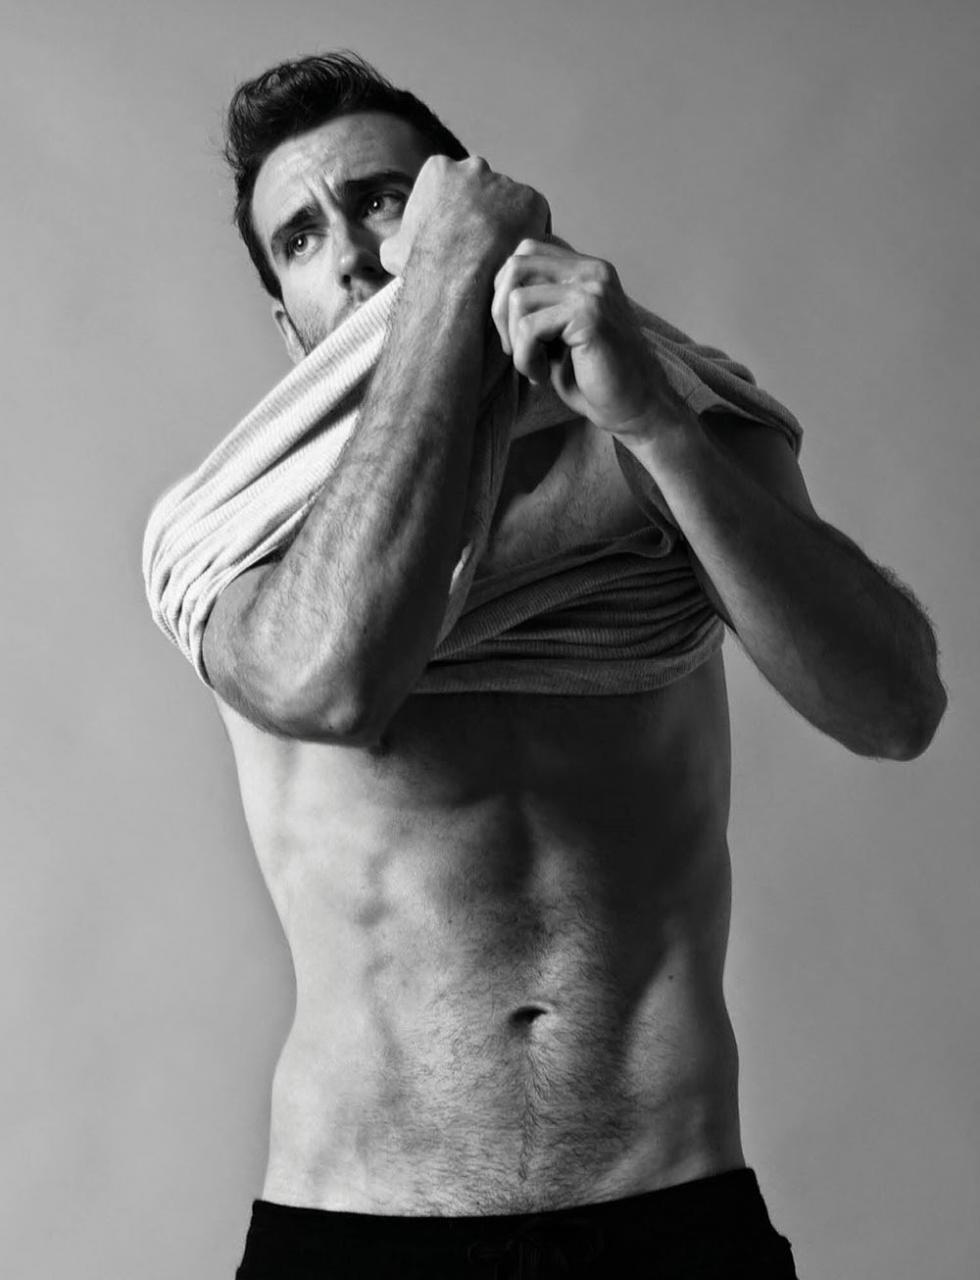 005BCJ4ogy1g0xewee7cwj30rs109tbl - 曾在哈利波特中饰演纳威·隆巴顿的男模 Matthew Lewis 马修·路易斯